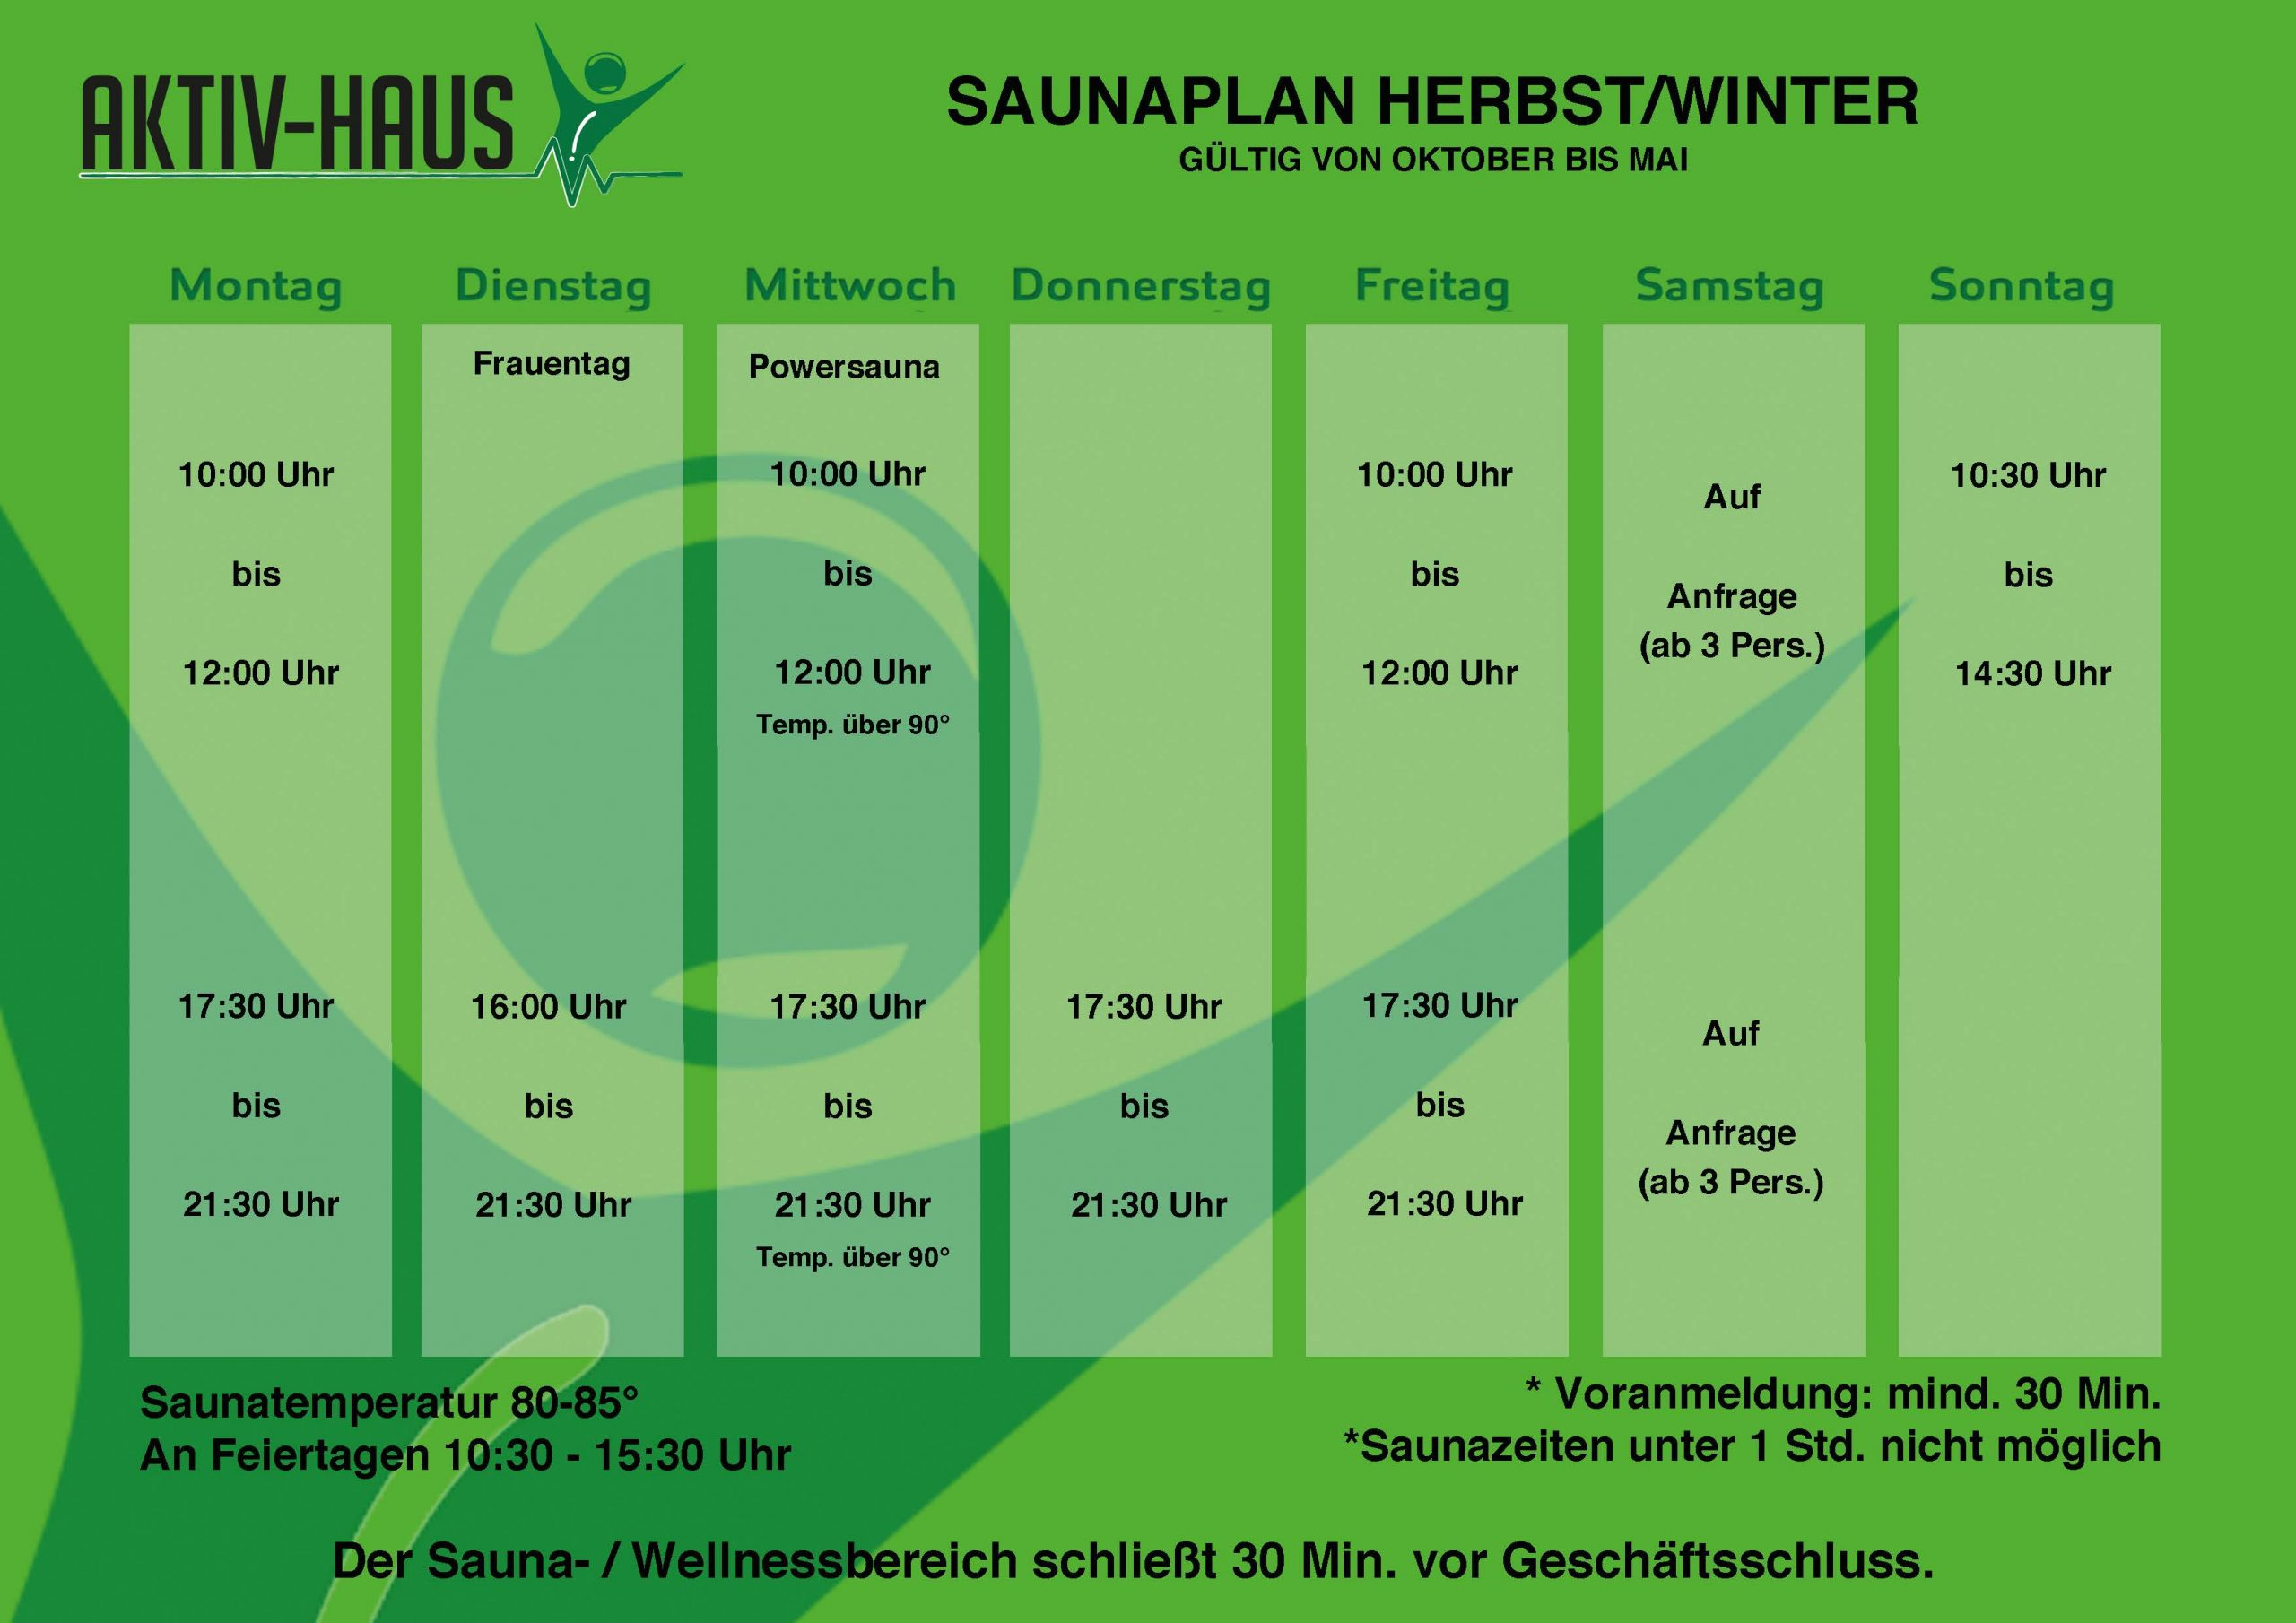 Saunaplan_HerbstWinter